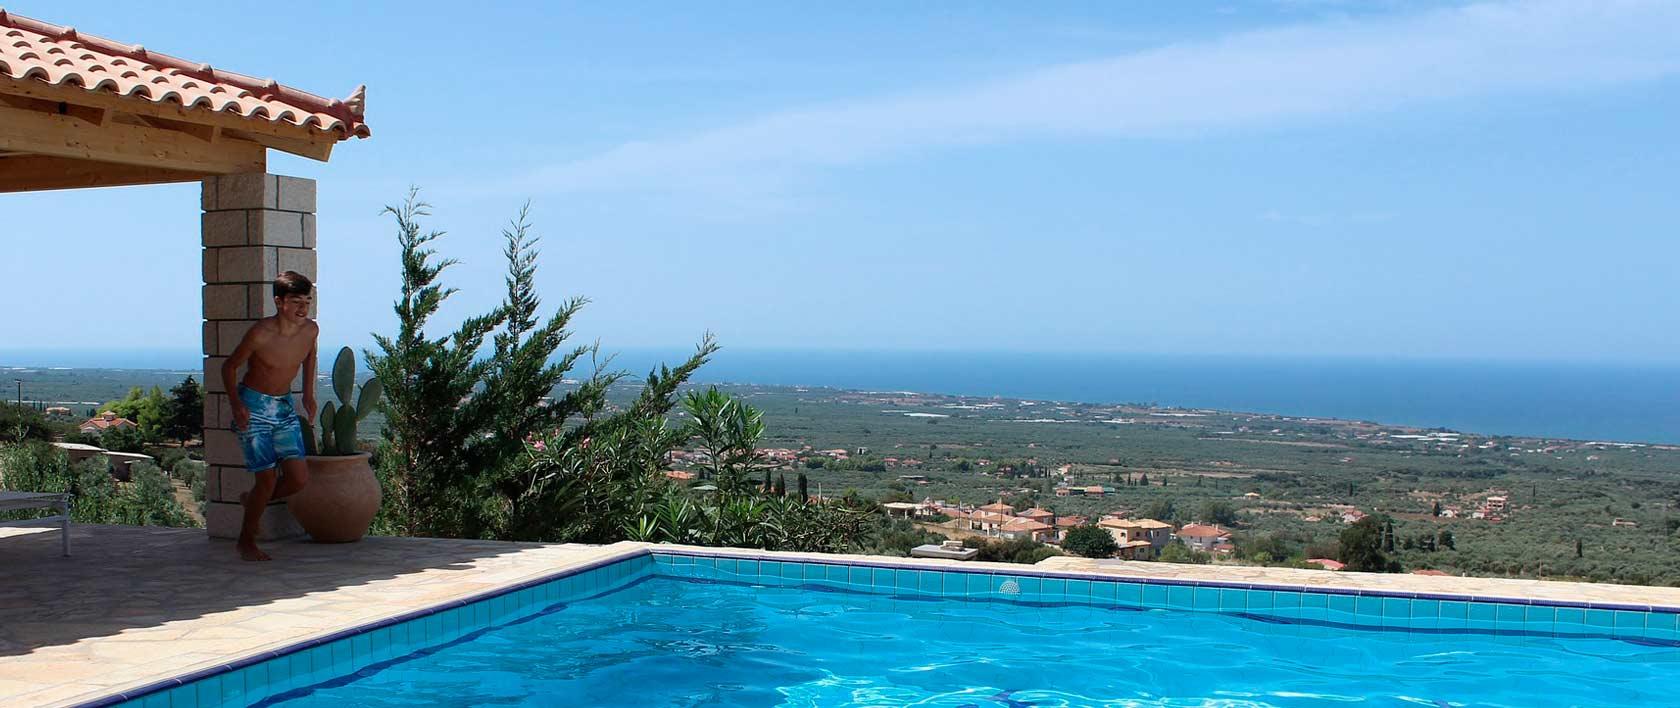 Protec piscine latest aquifolies with protec piscine for Portillon piscine